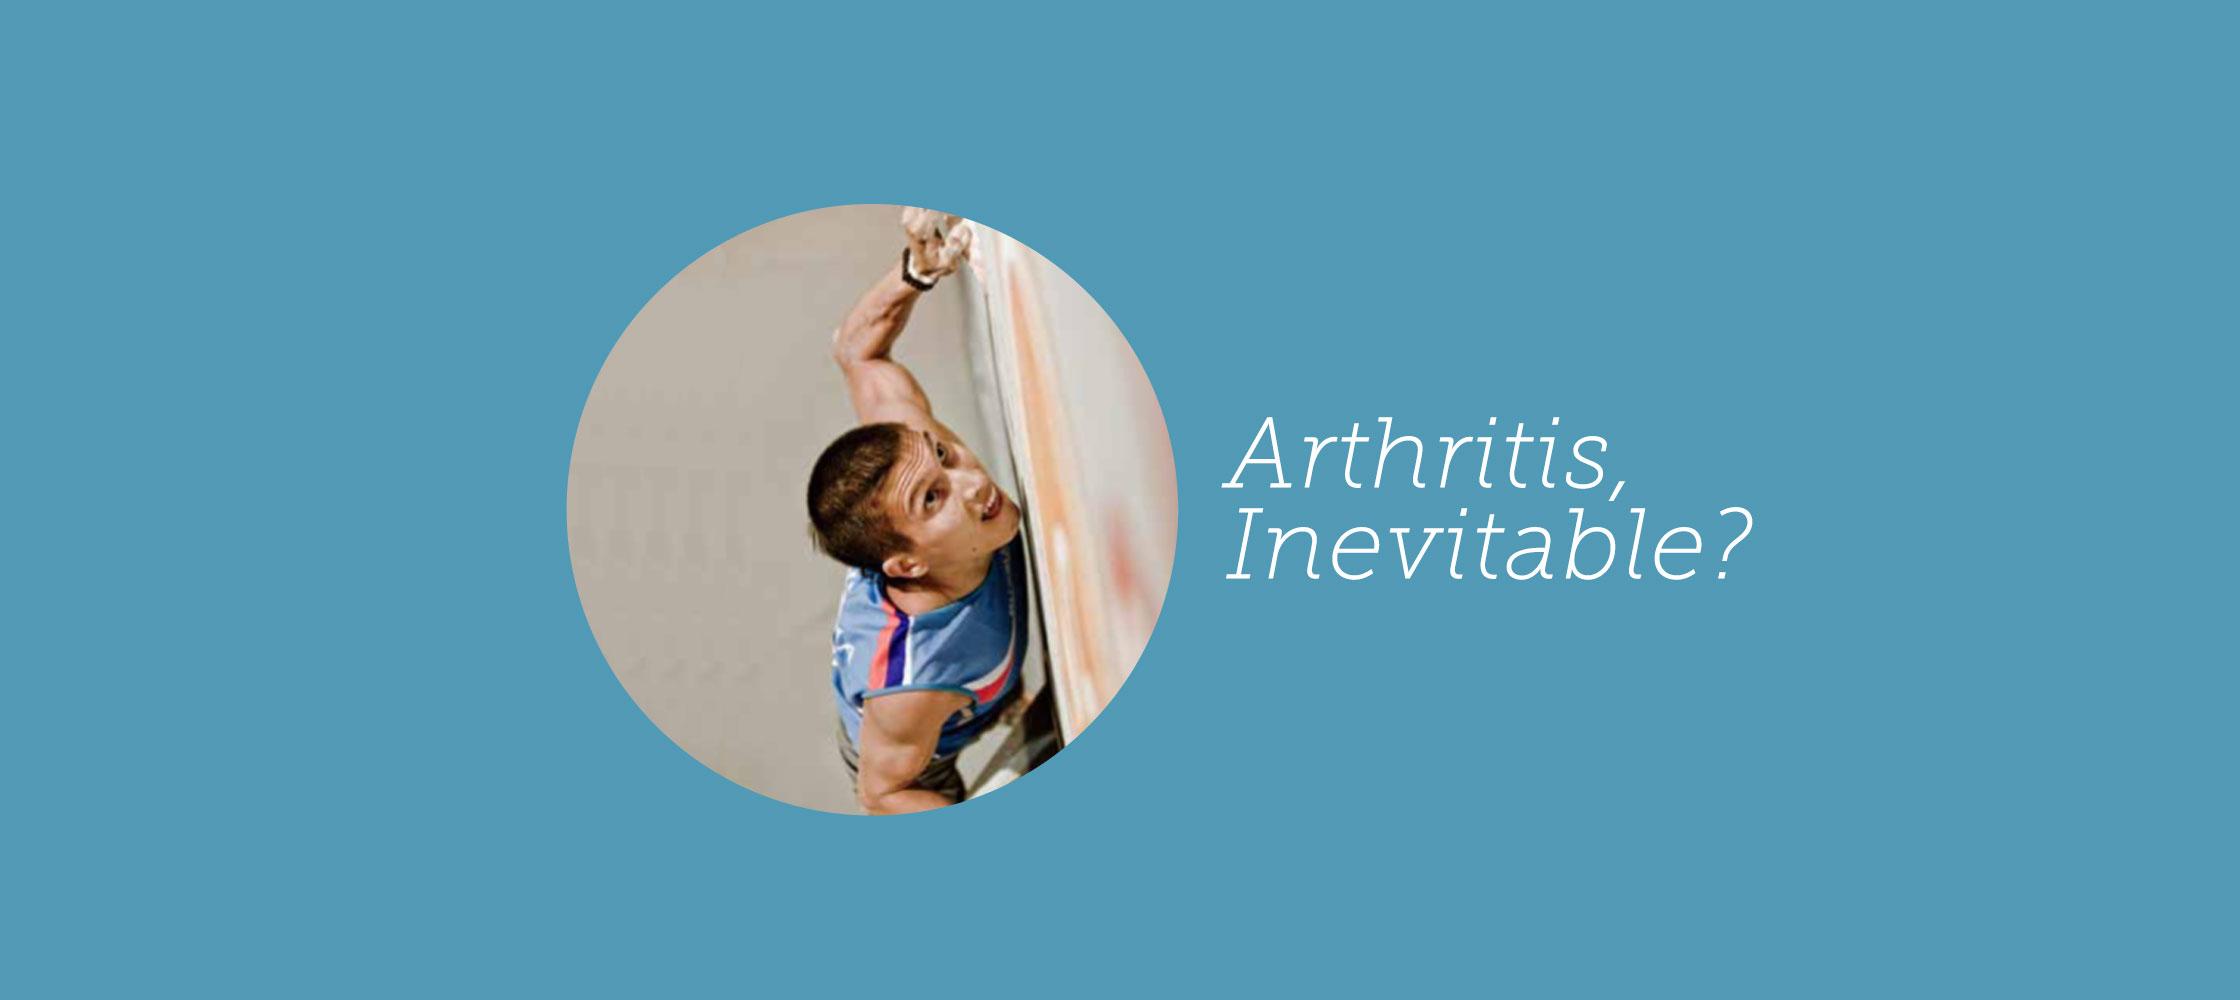 199-arthritis-inevitable